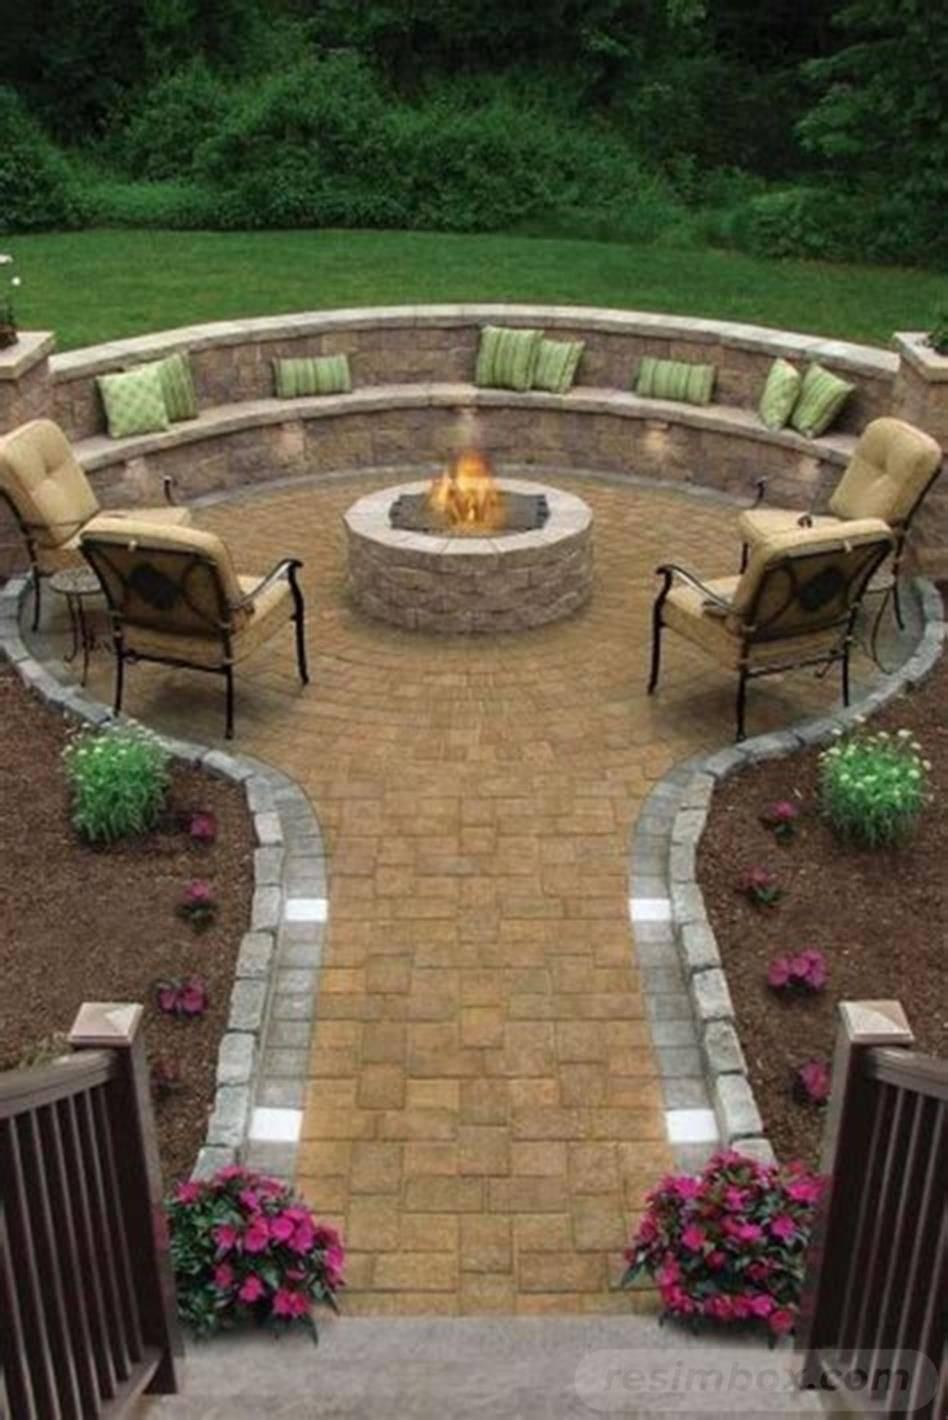 amazing garden ideas-686869380648107631